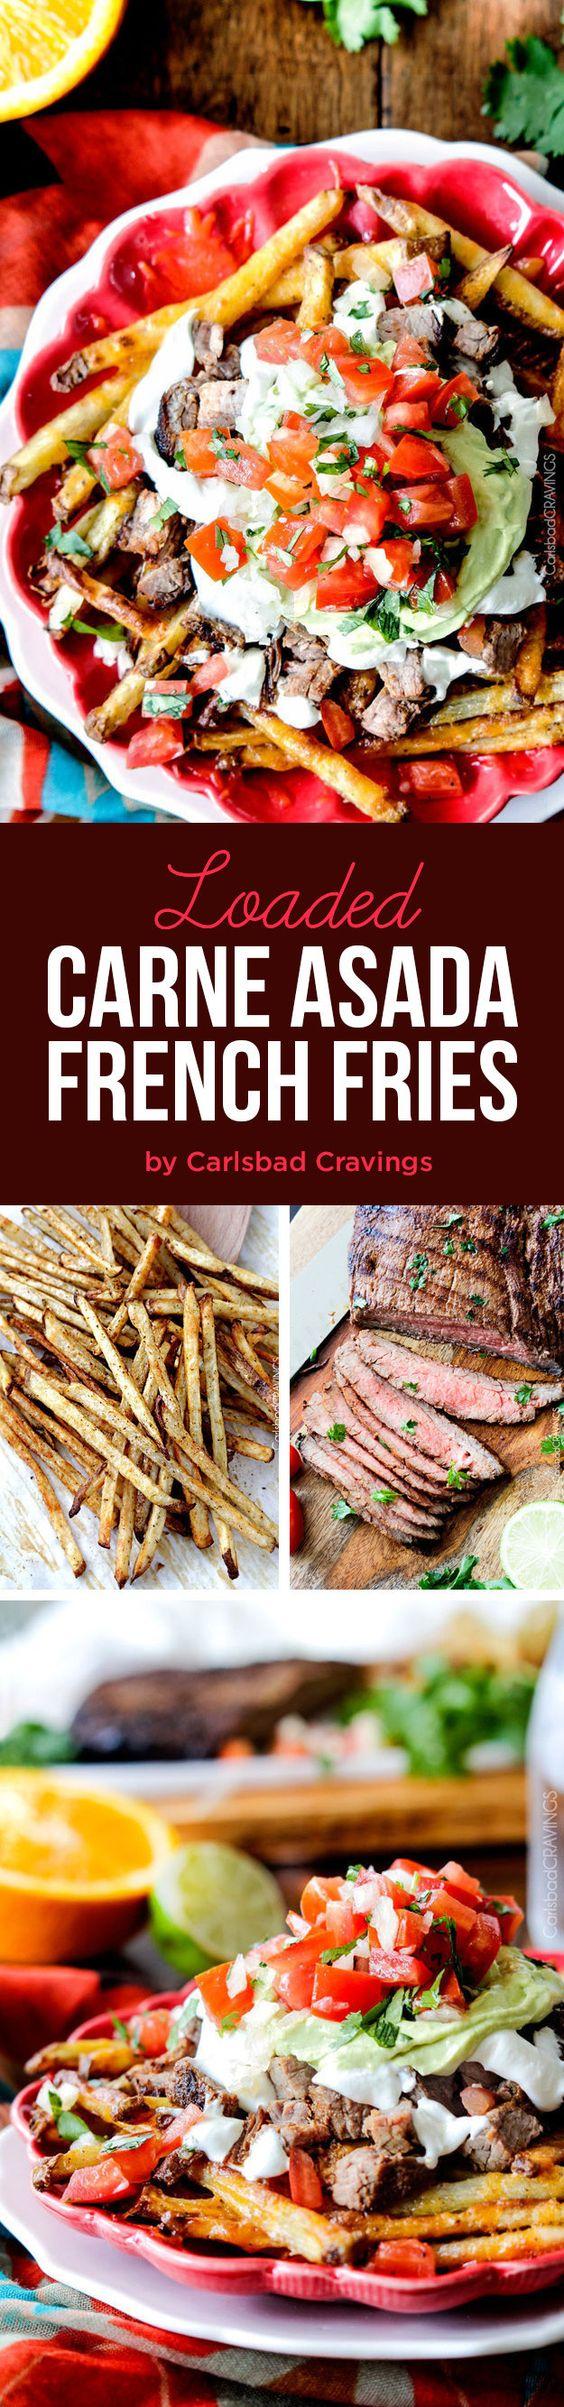 Loaded Carne Asada French Fries